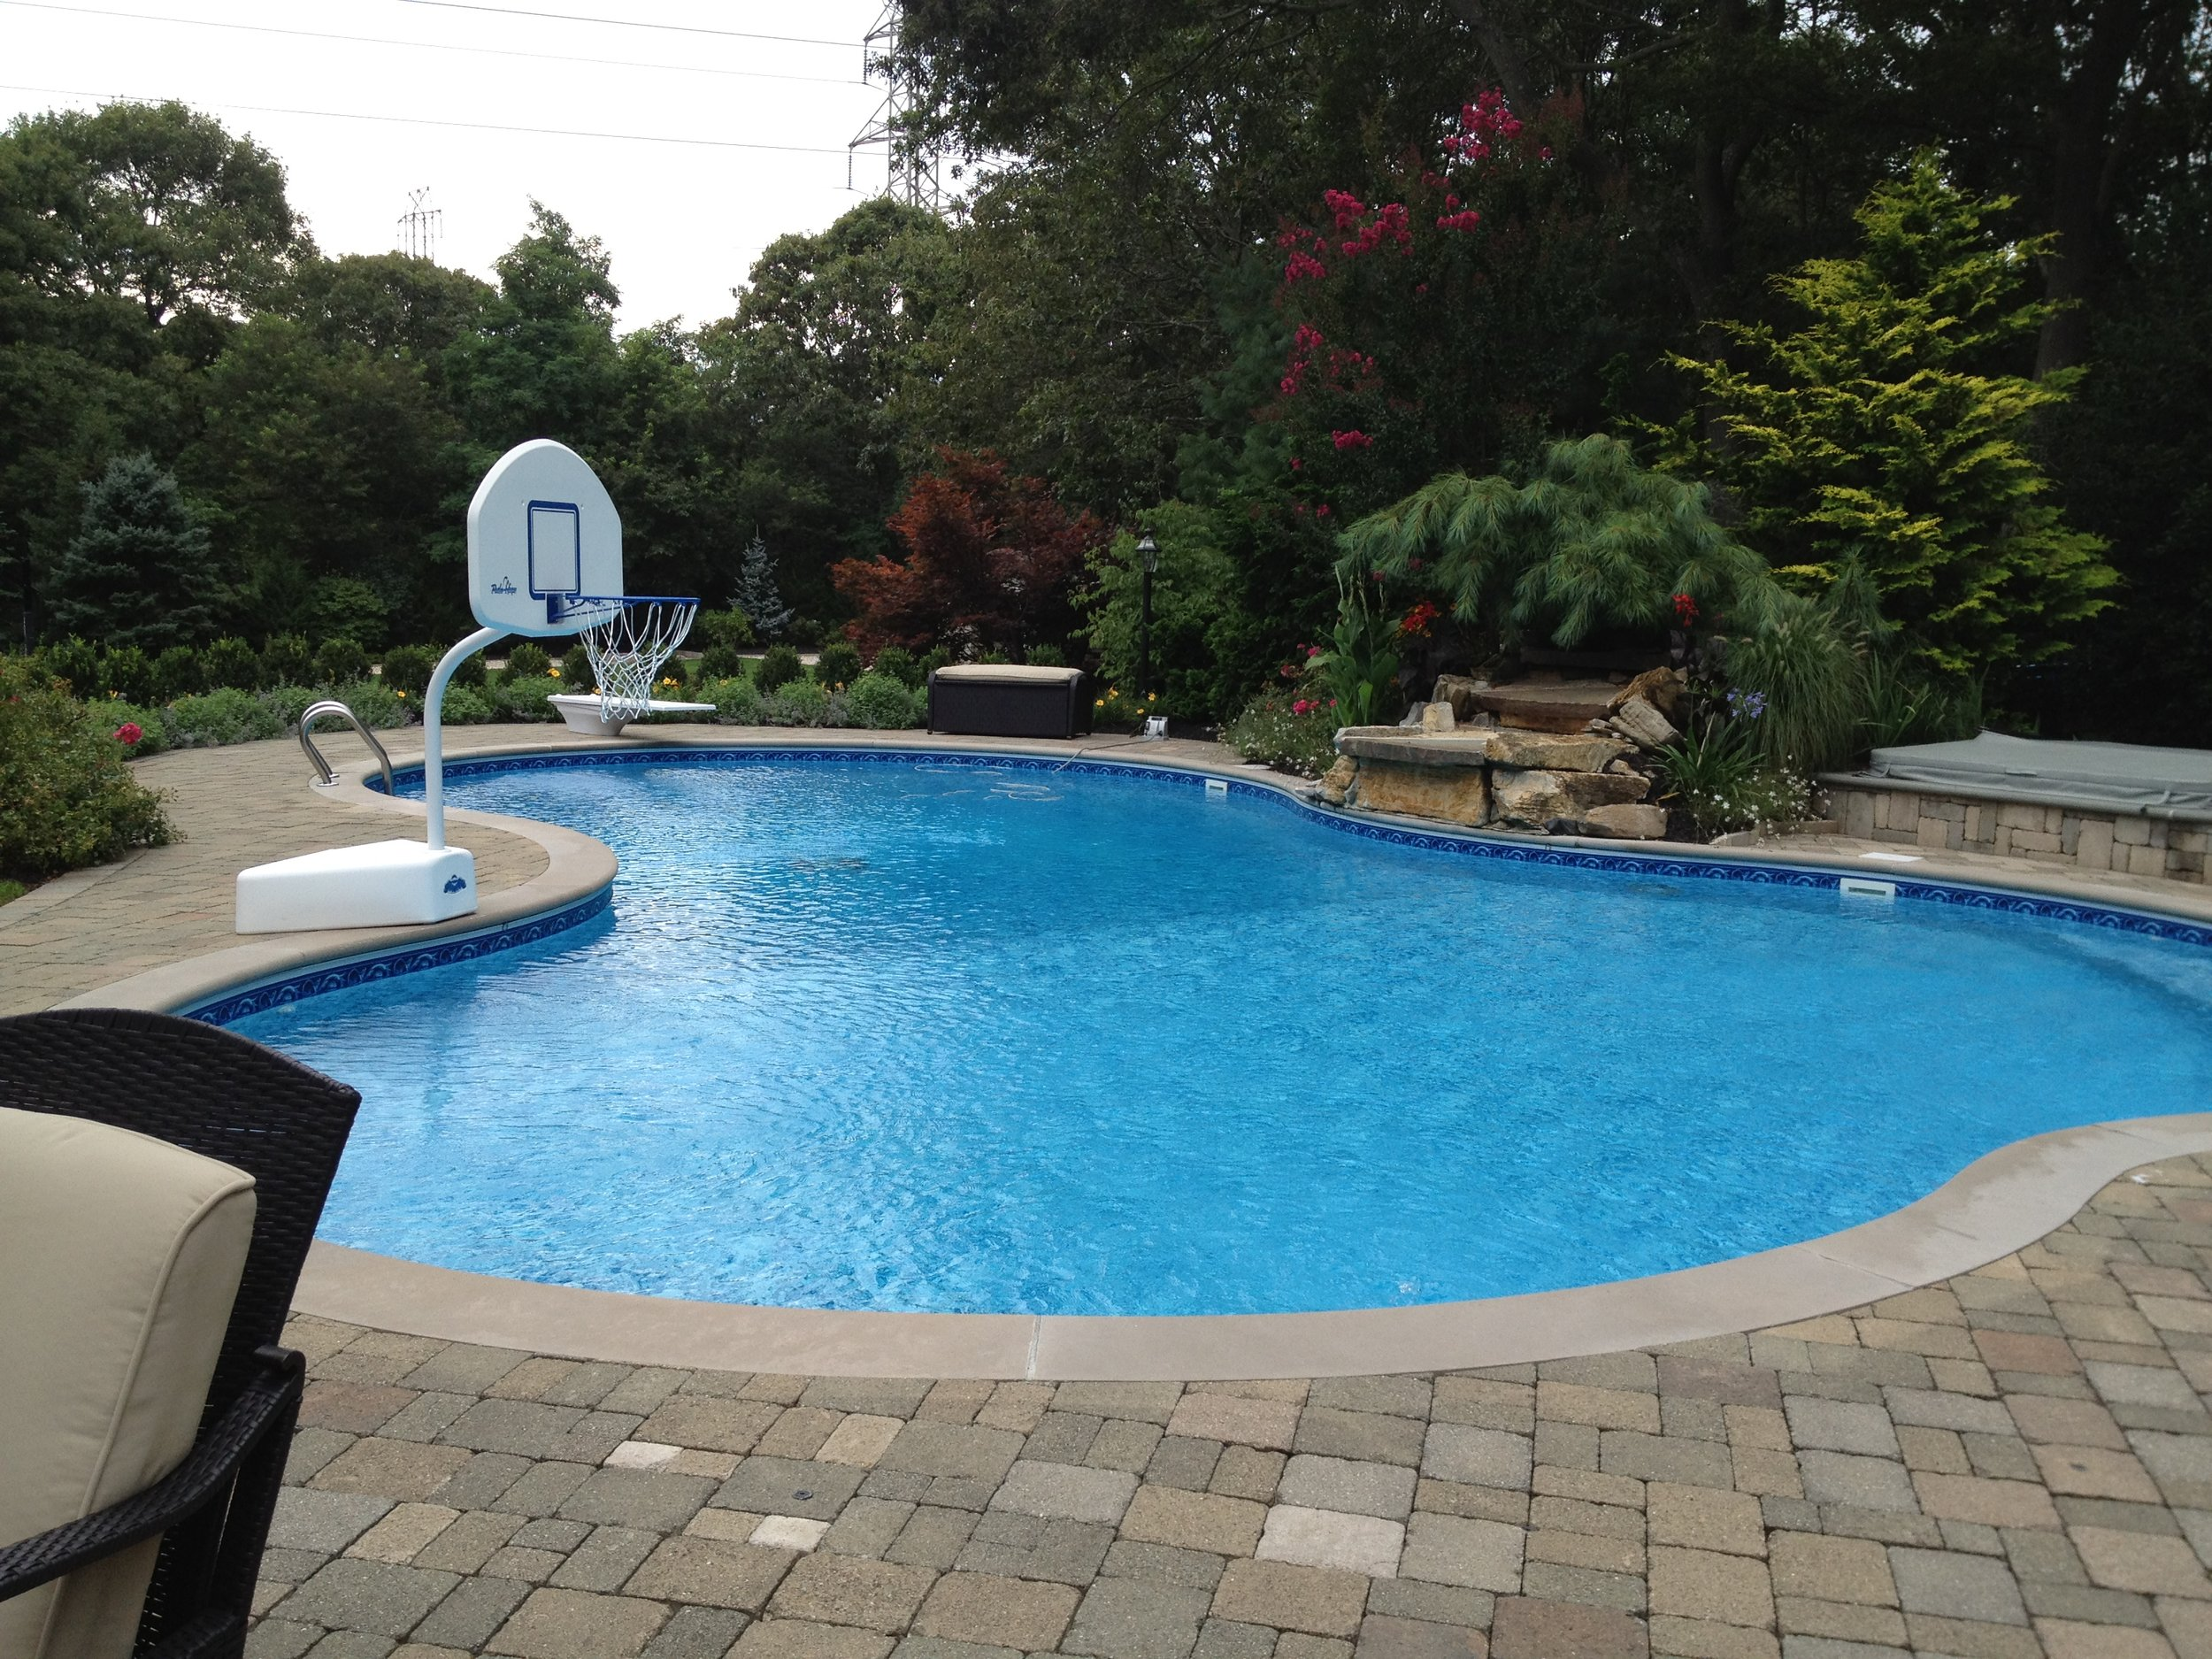 Professional pool patio landscape design company in Long Island, NY